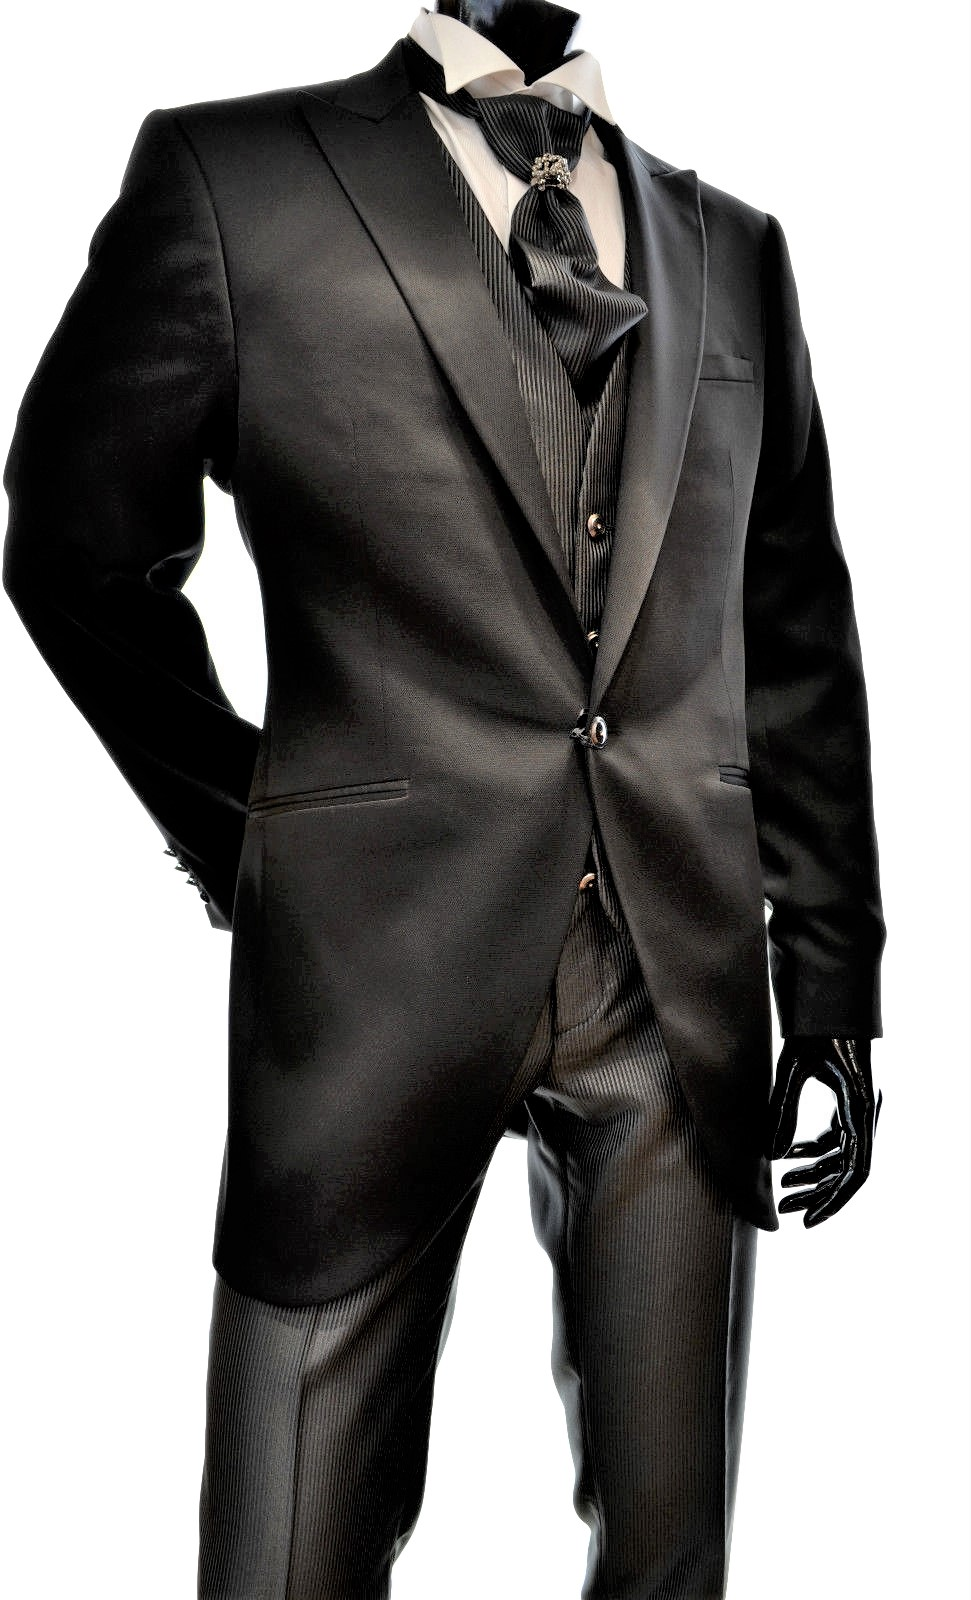 Abiti Da Cerimonia Tg 52.Mens Groom Wedding Dress Size 52 Drop 7 Tight Jacket Waistcoat